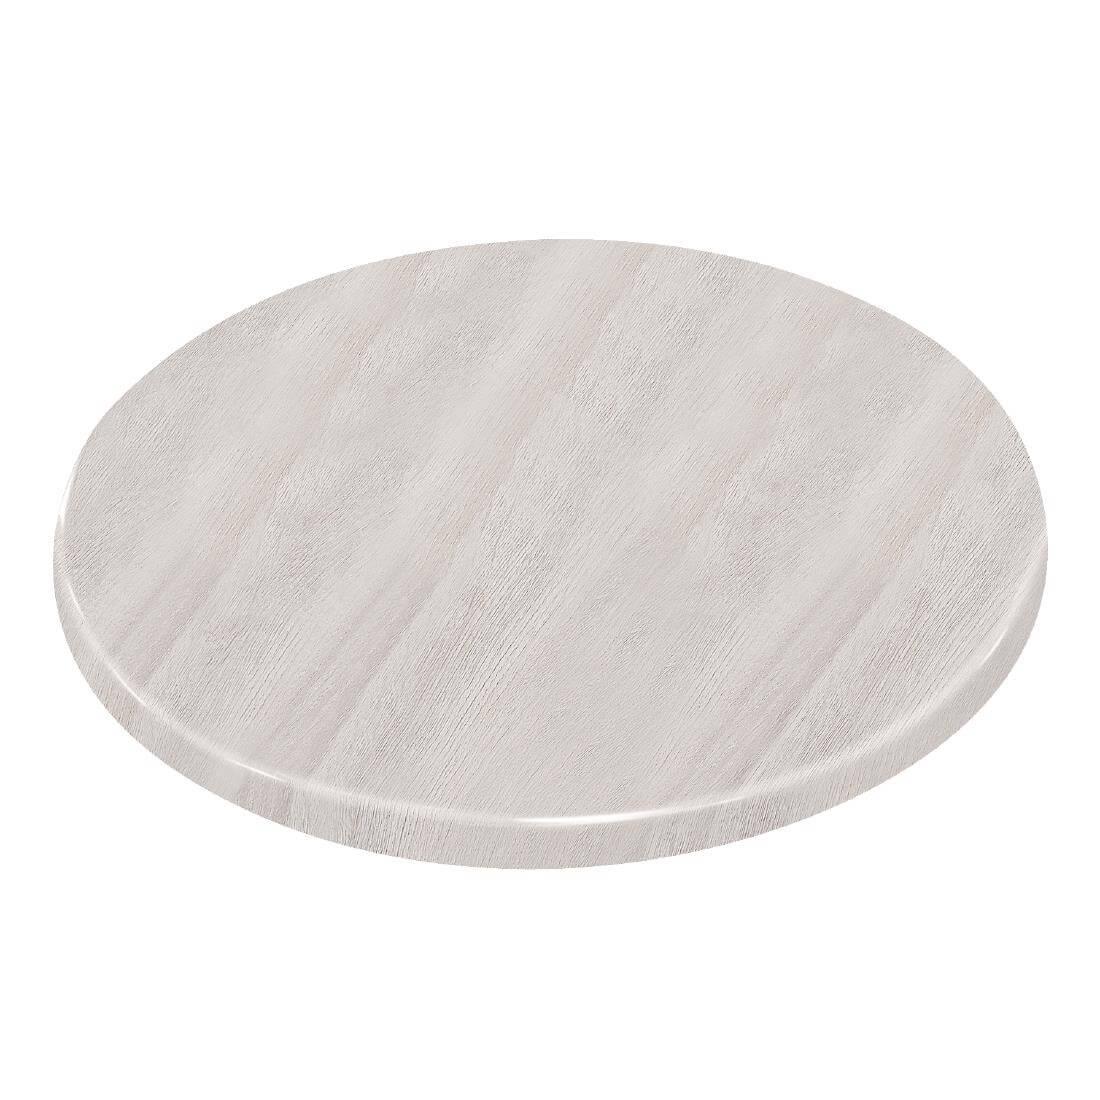 Bolero Round - Whitewash